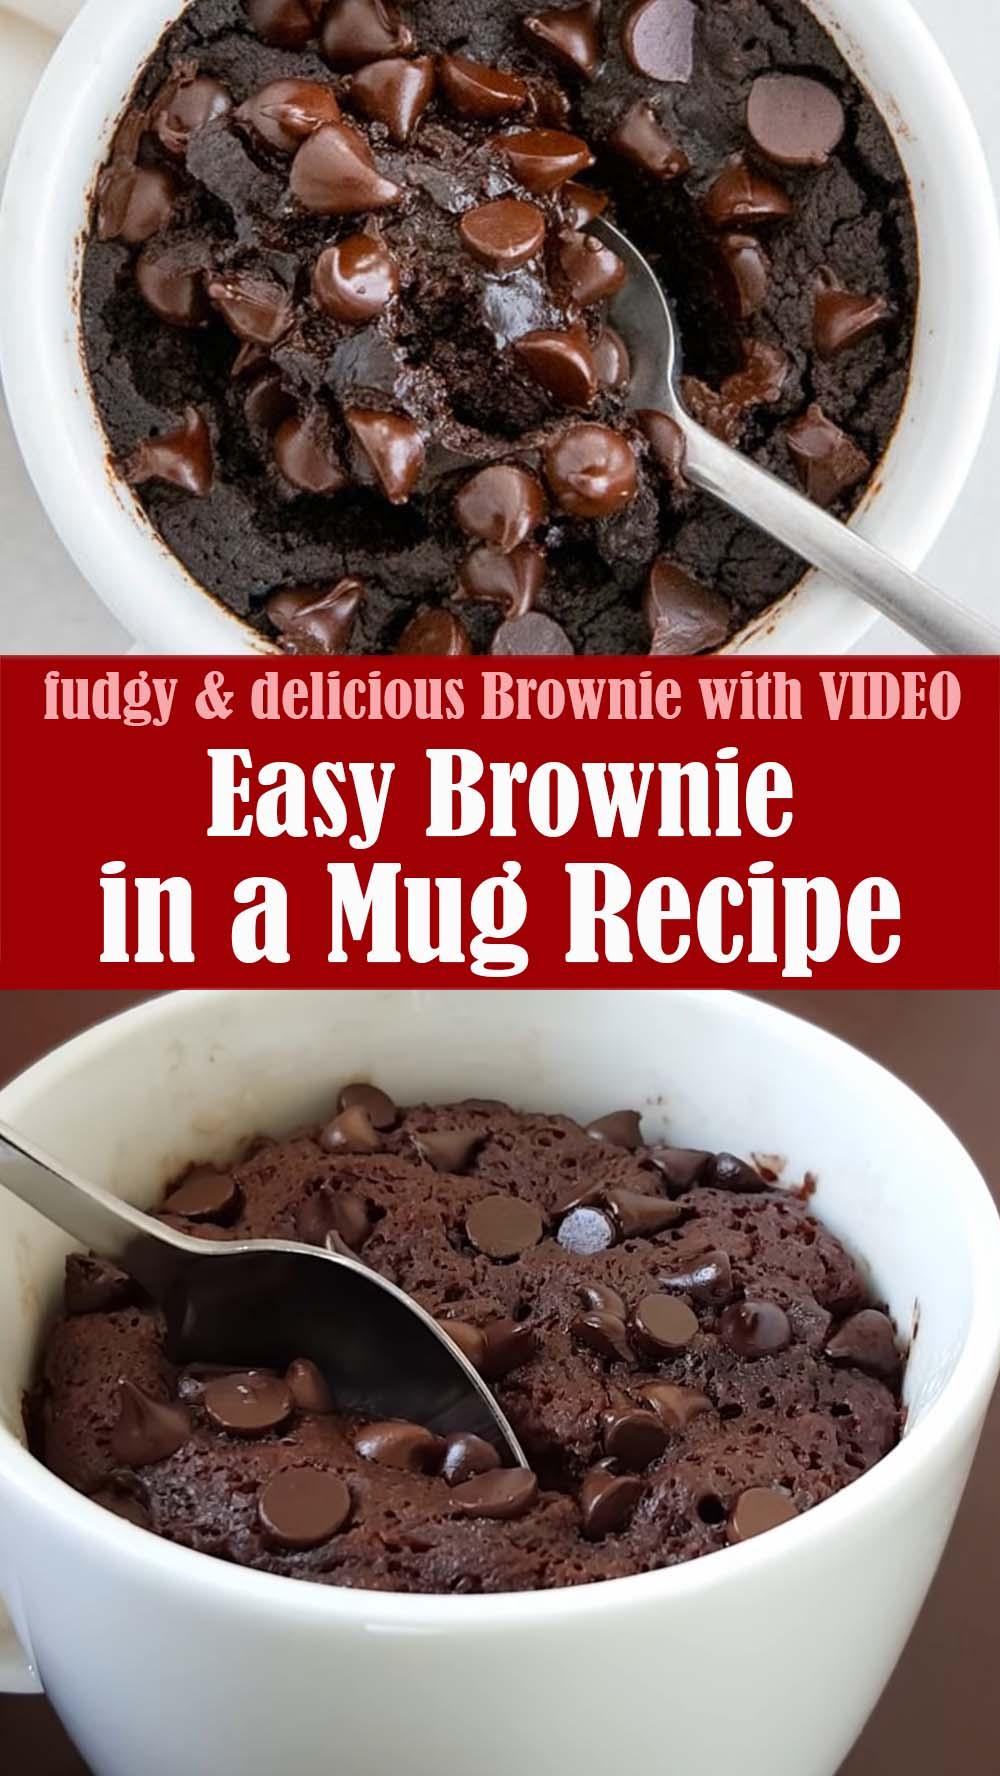 Easy Brownie in a Mug Recipe